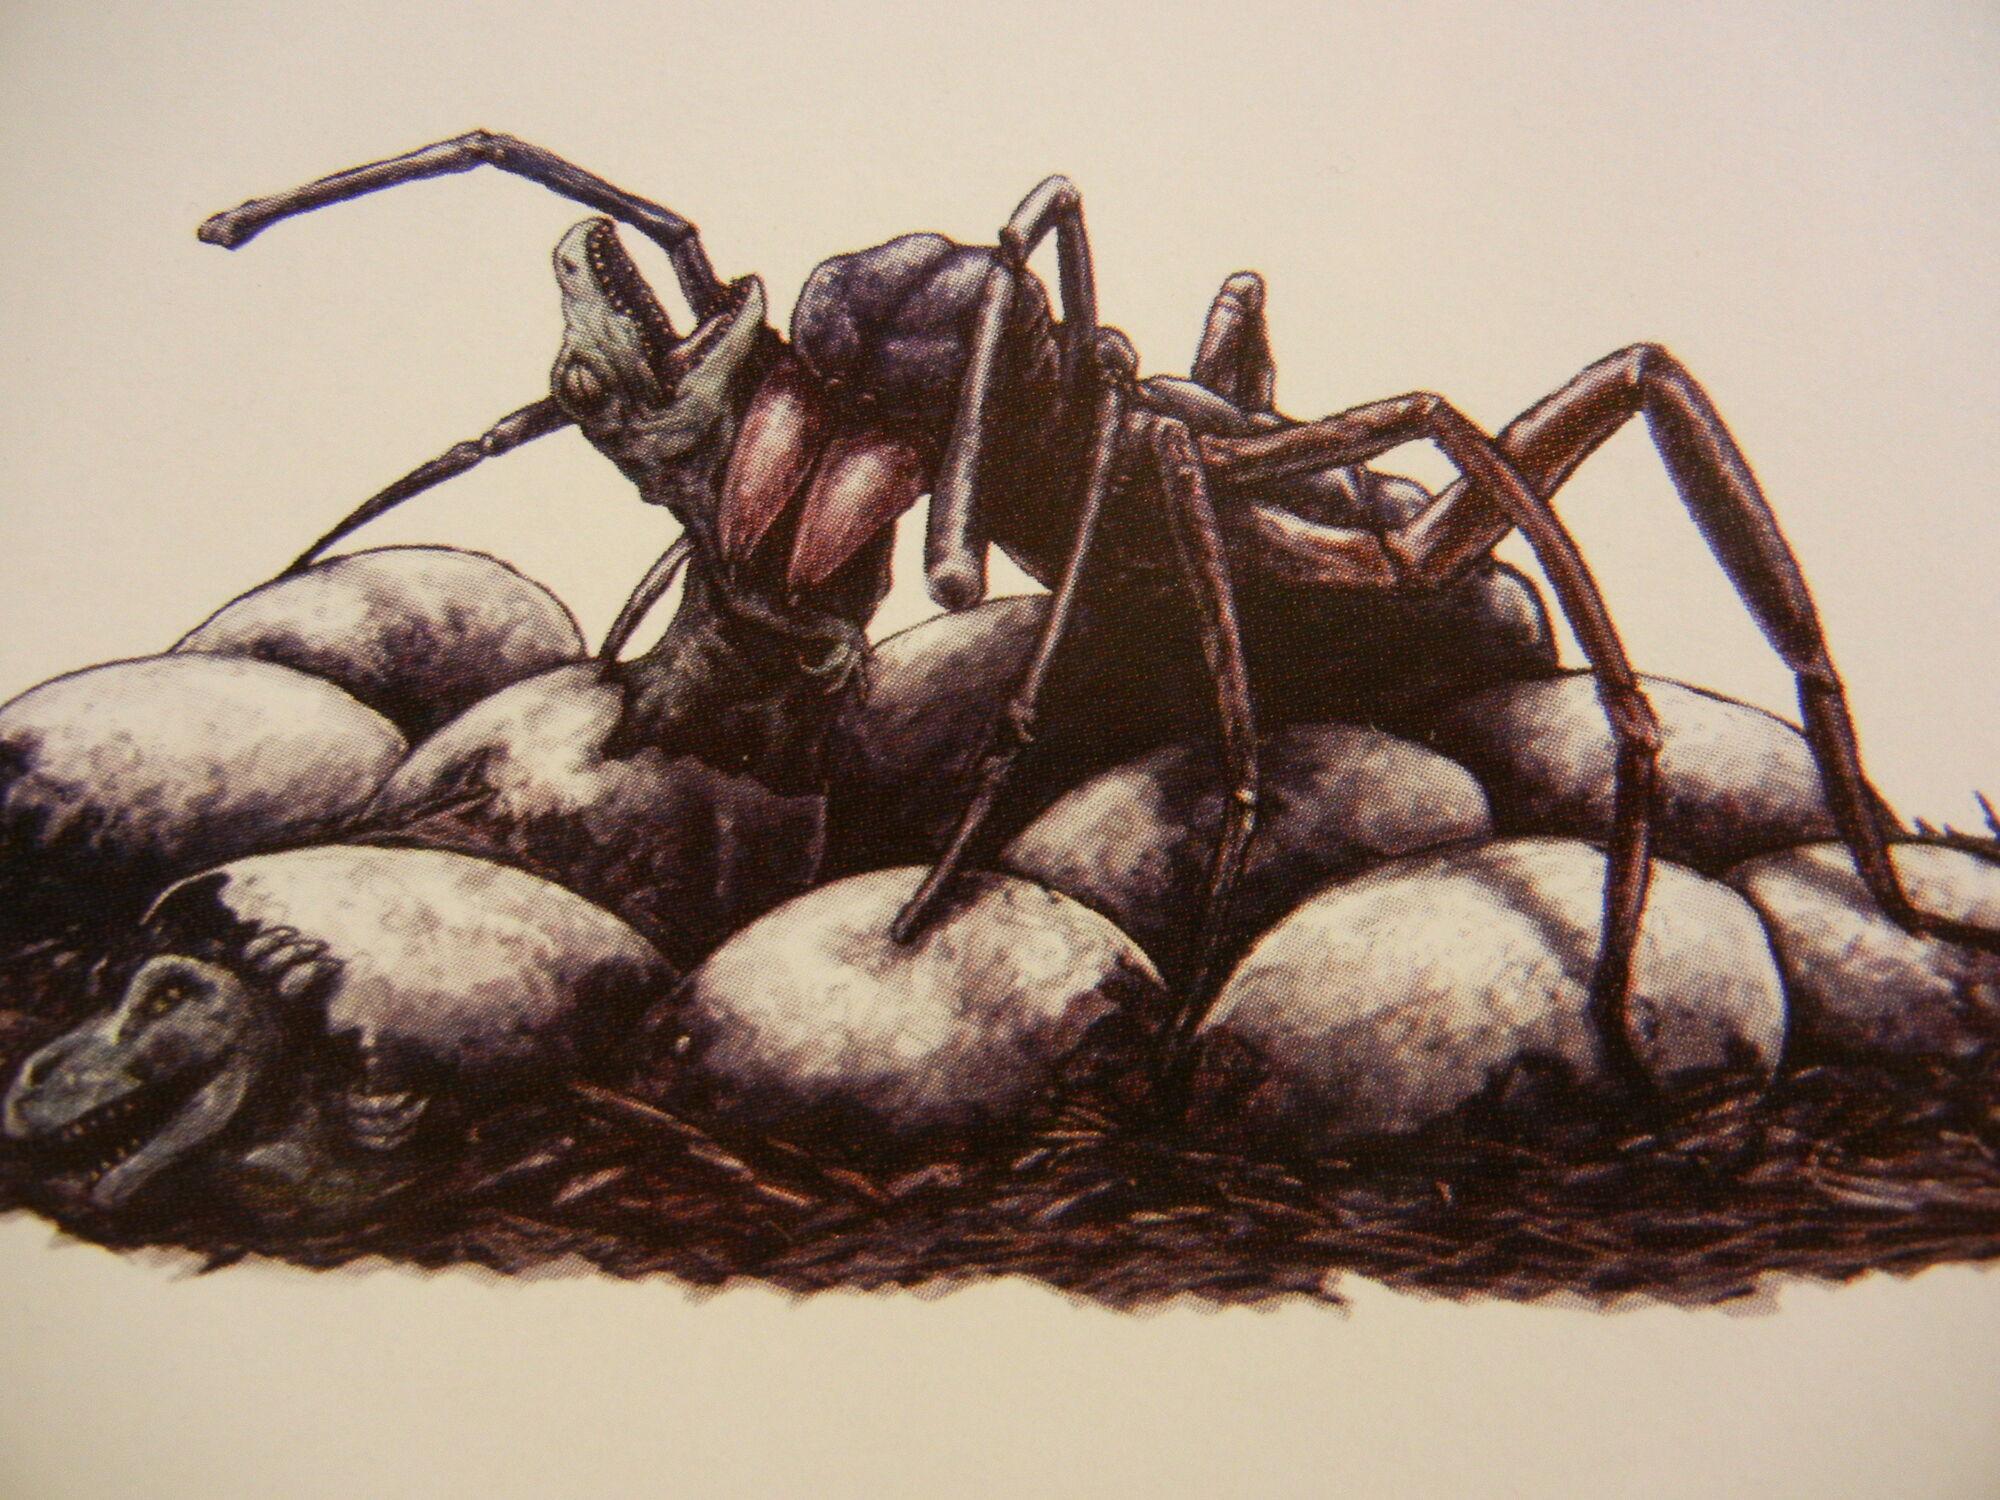 Category:Invertebrate | King Kong Wiki | FANDOM powered by ...